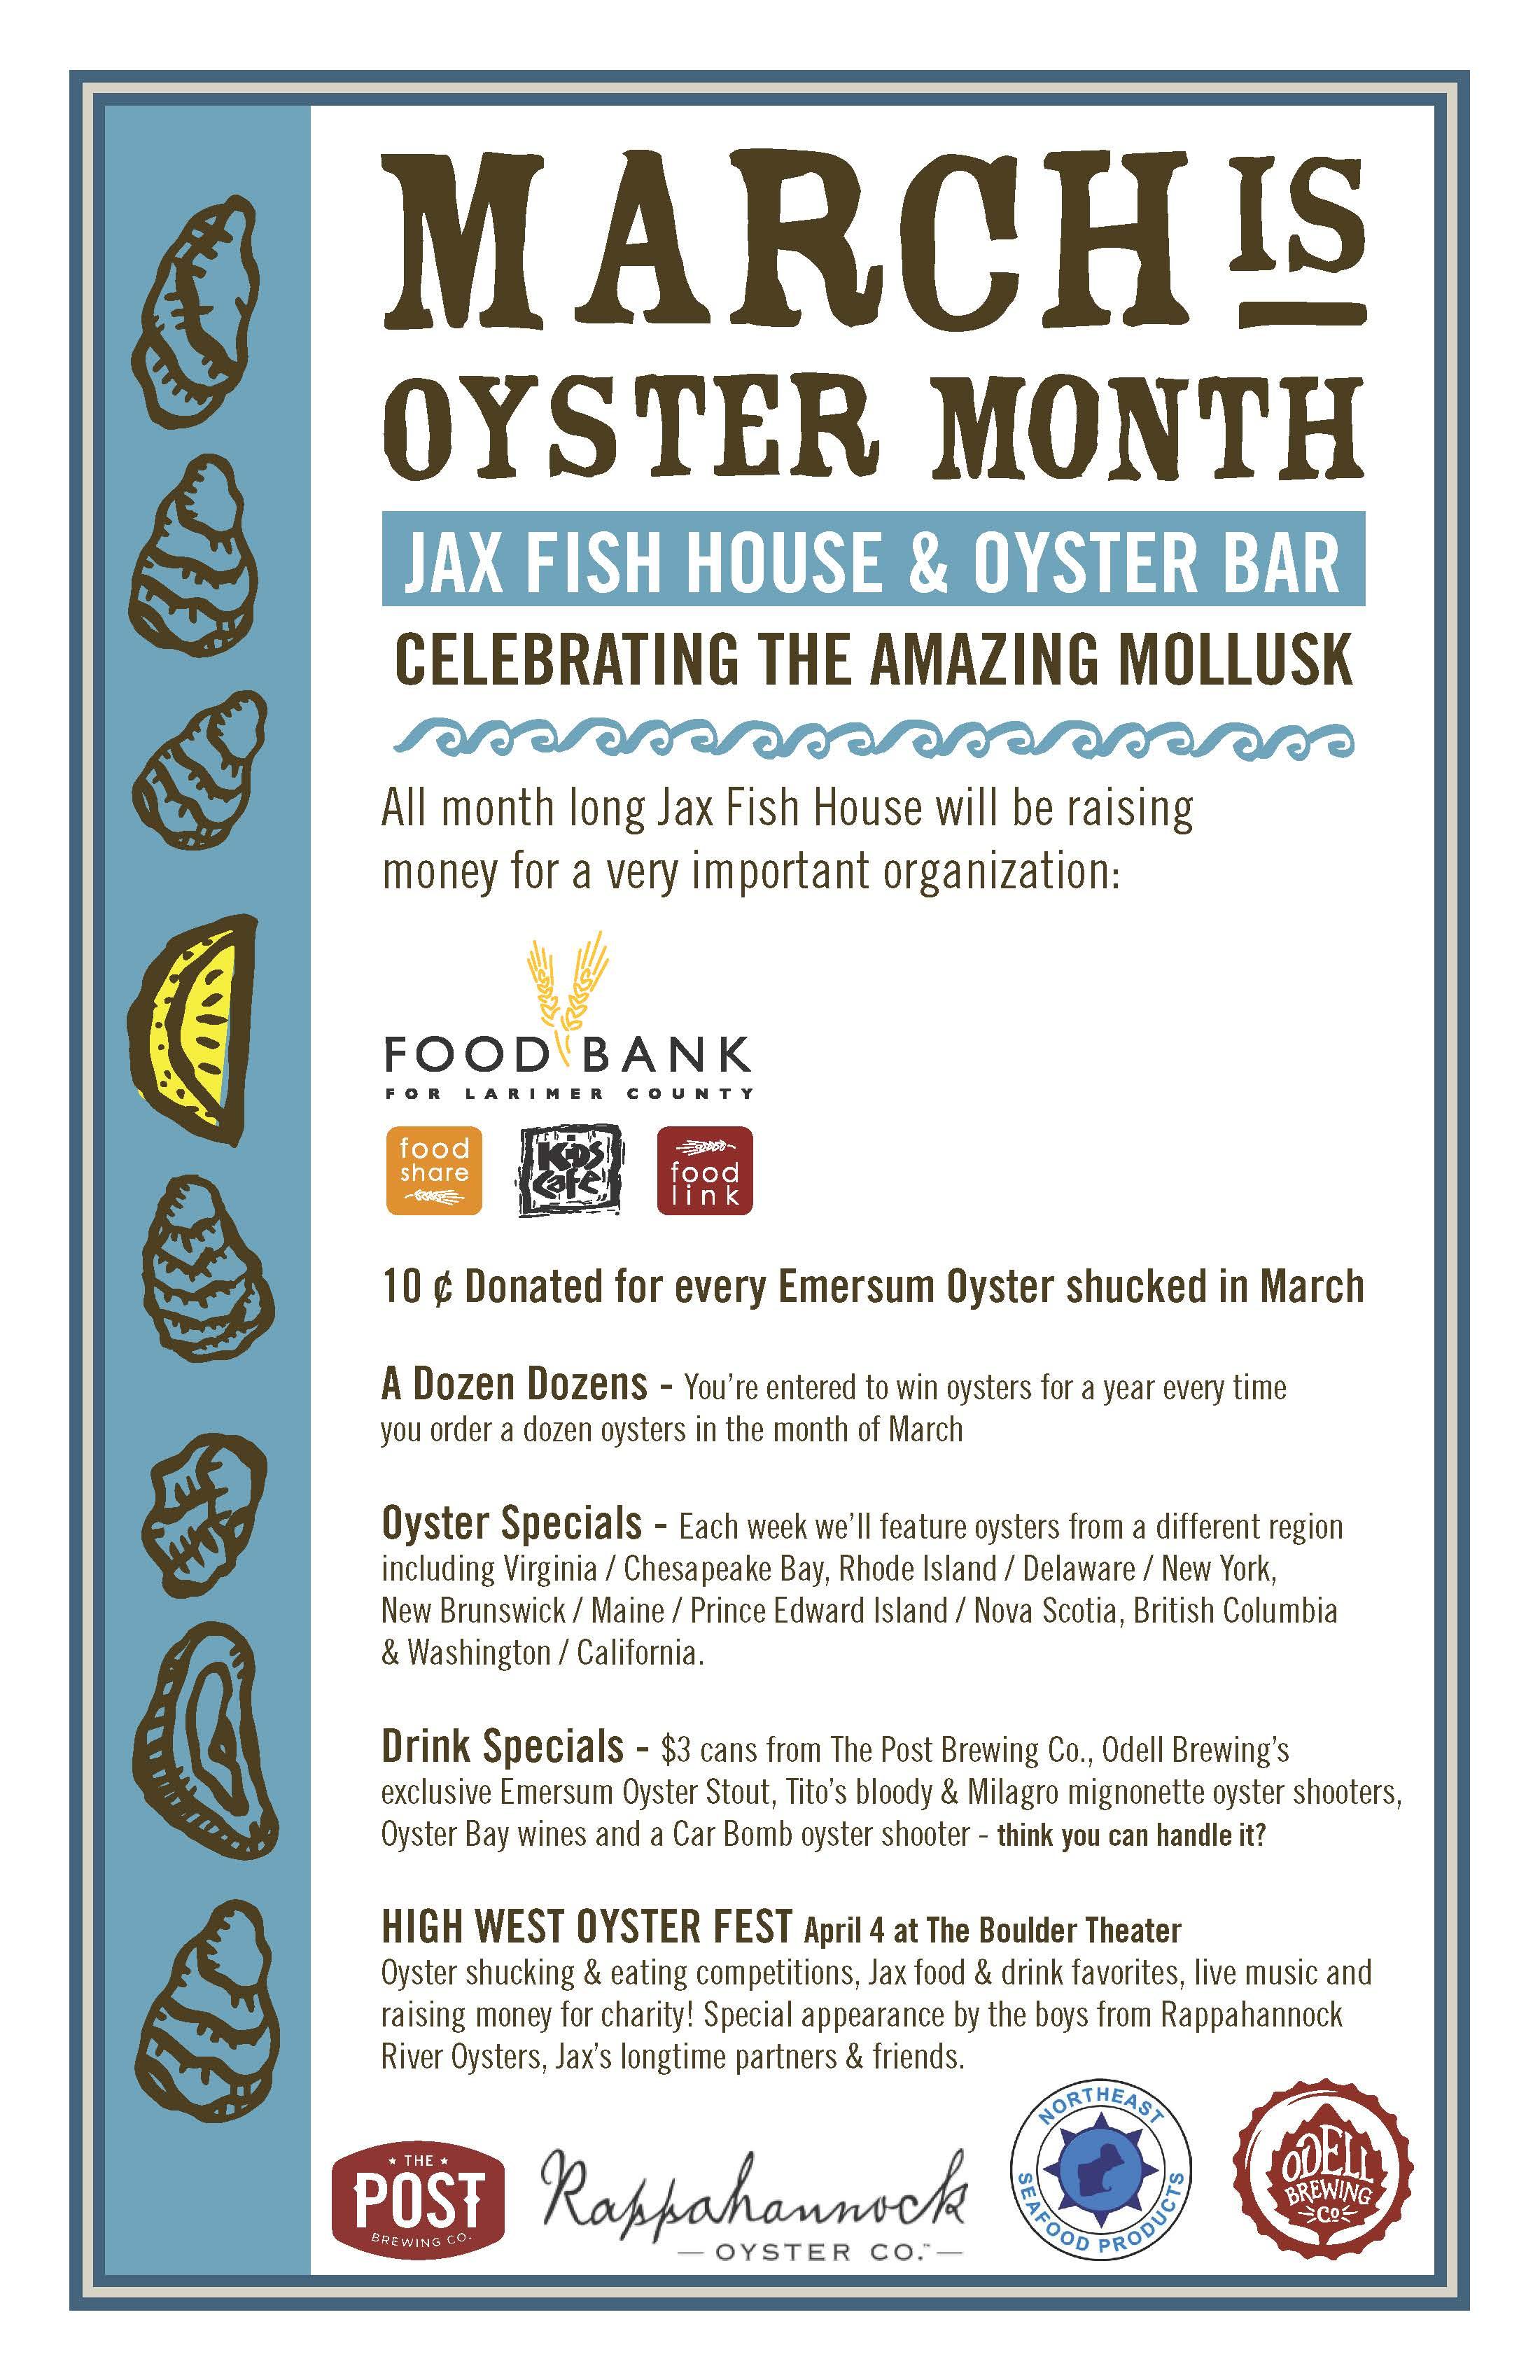 Oyster Month at JAX Fish House Food Bank